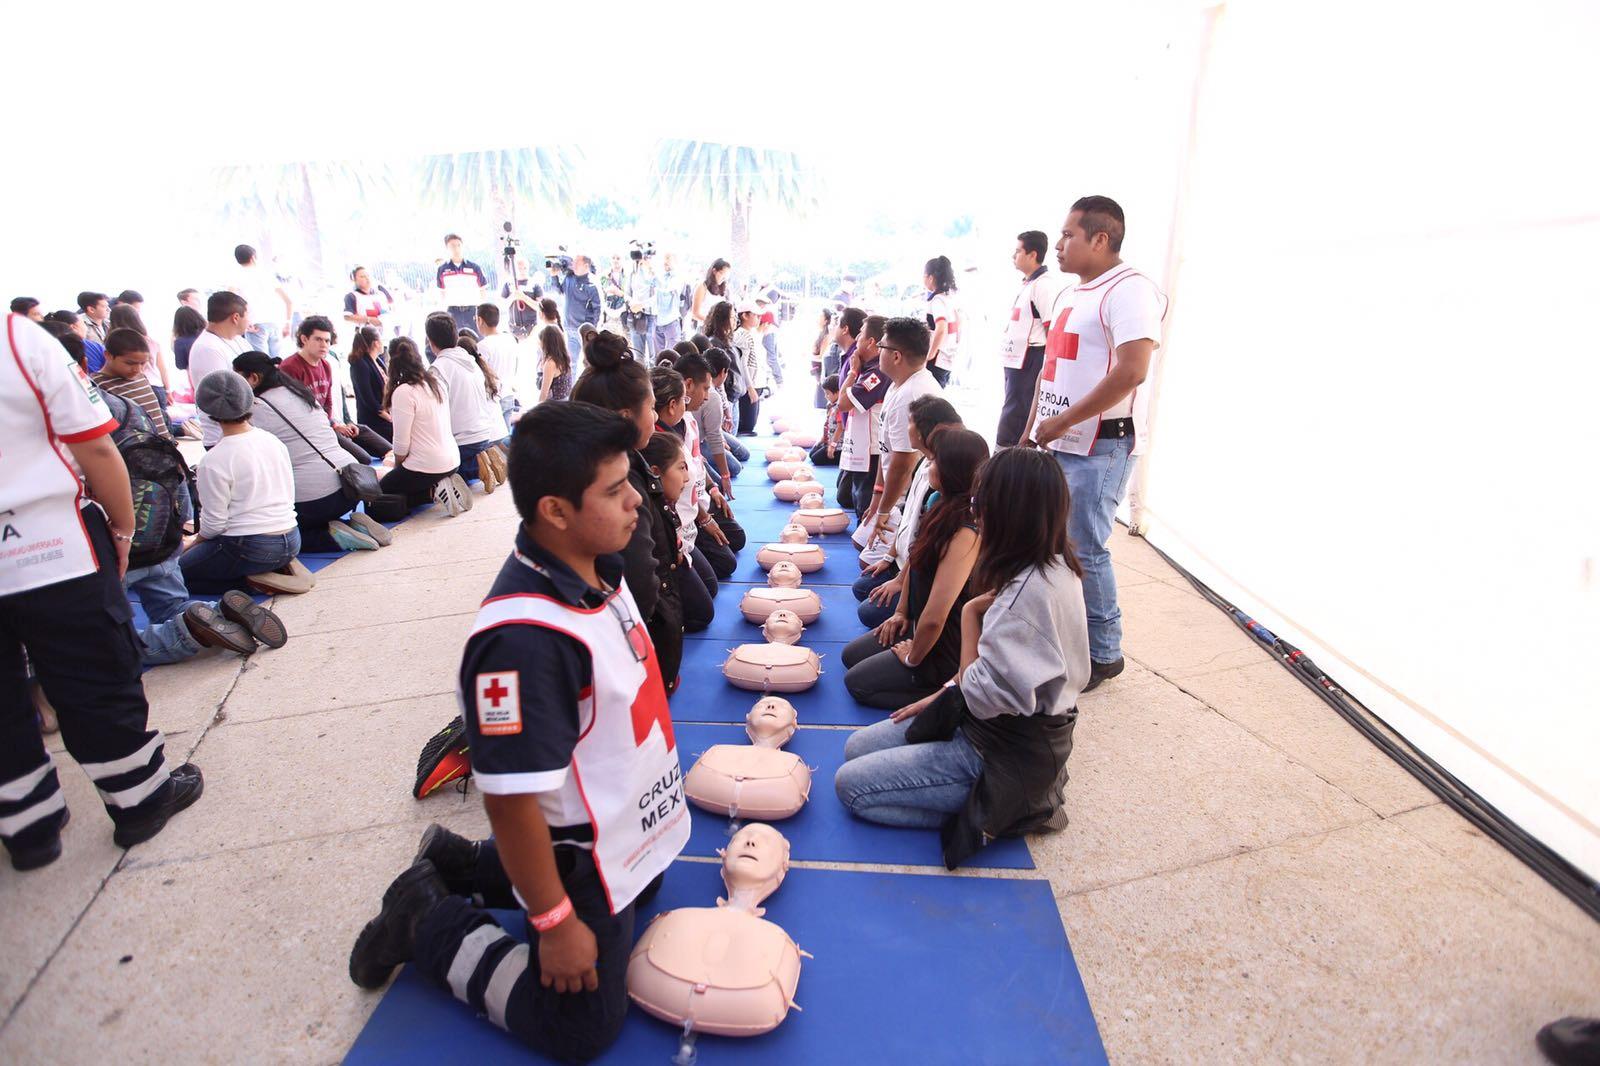 Capacita Gobierno de CDMX a población en reanimación cardiopulmonar; se busca romper récord Guinness